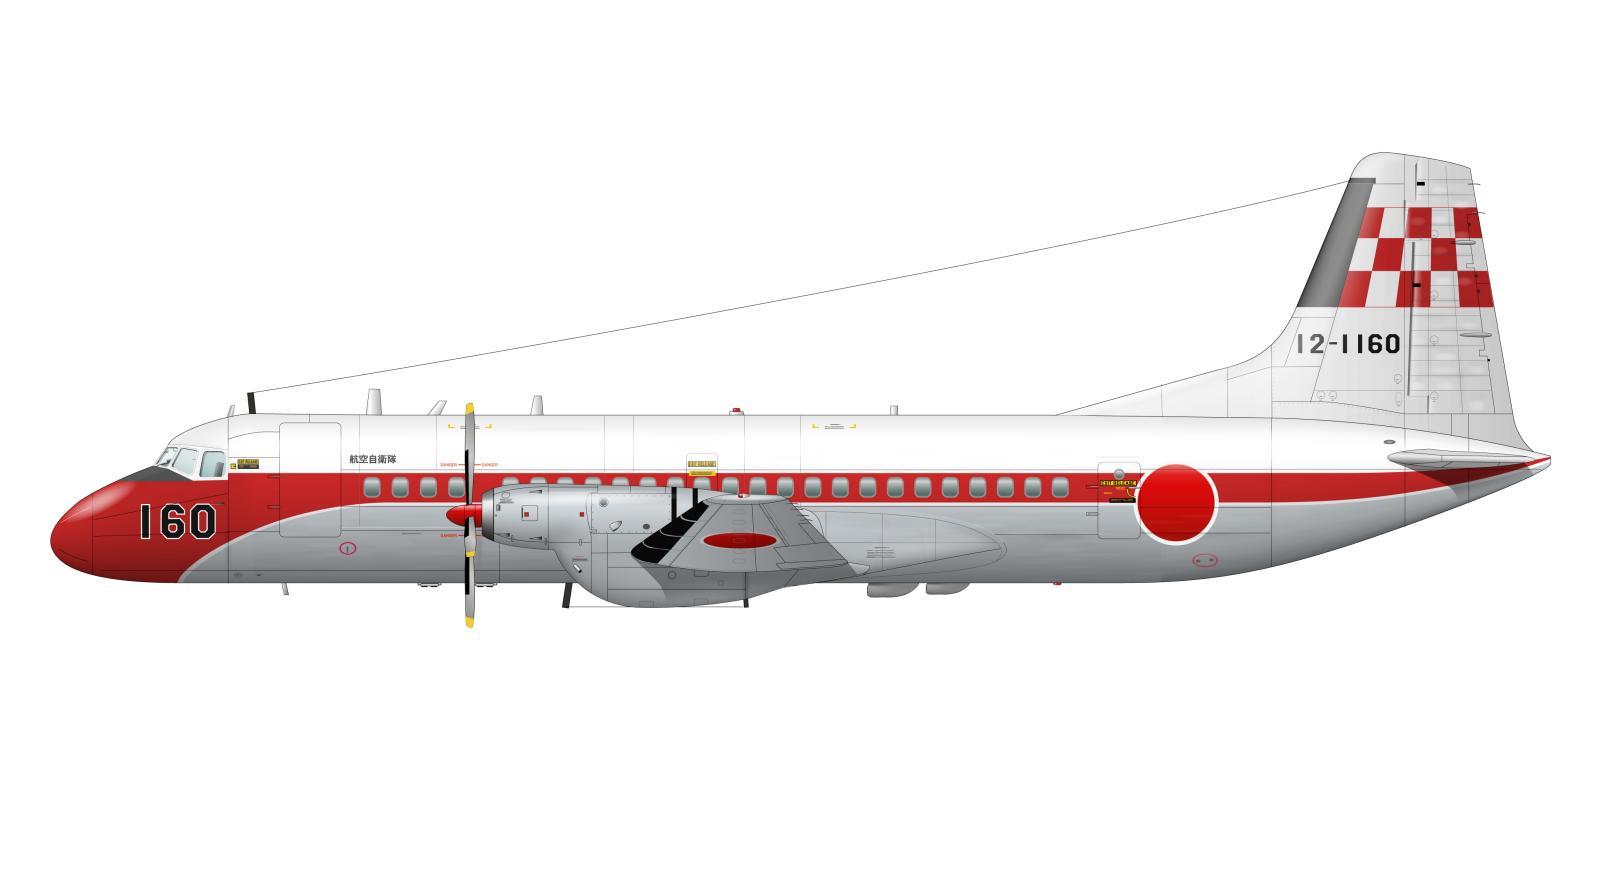 YS-11FC 点検隊 #160 初期塗装